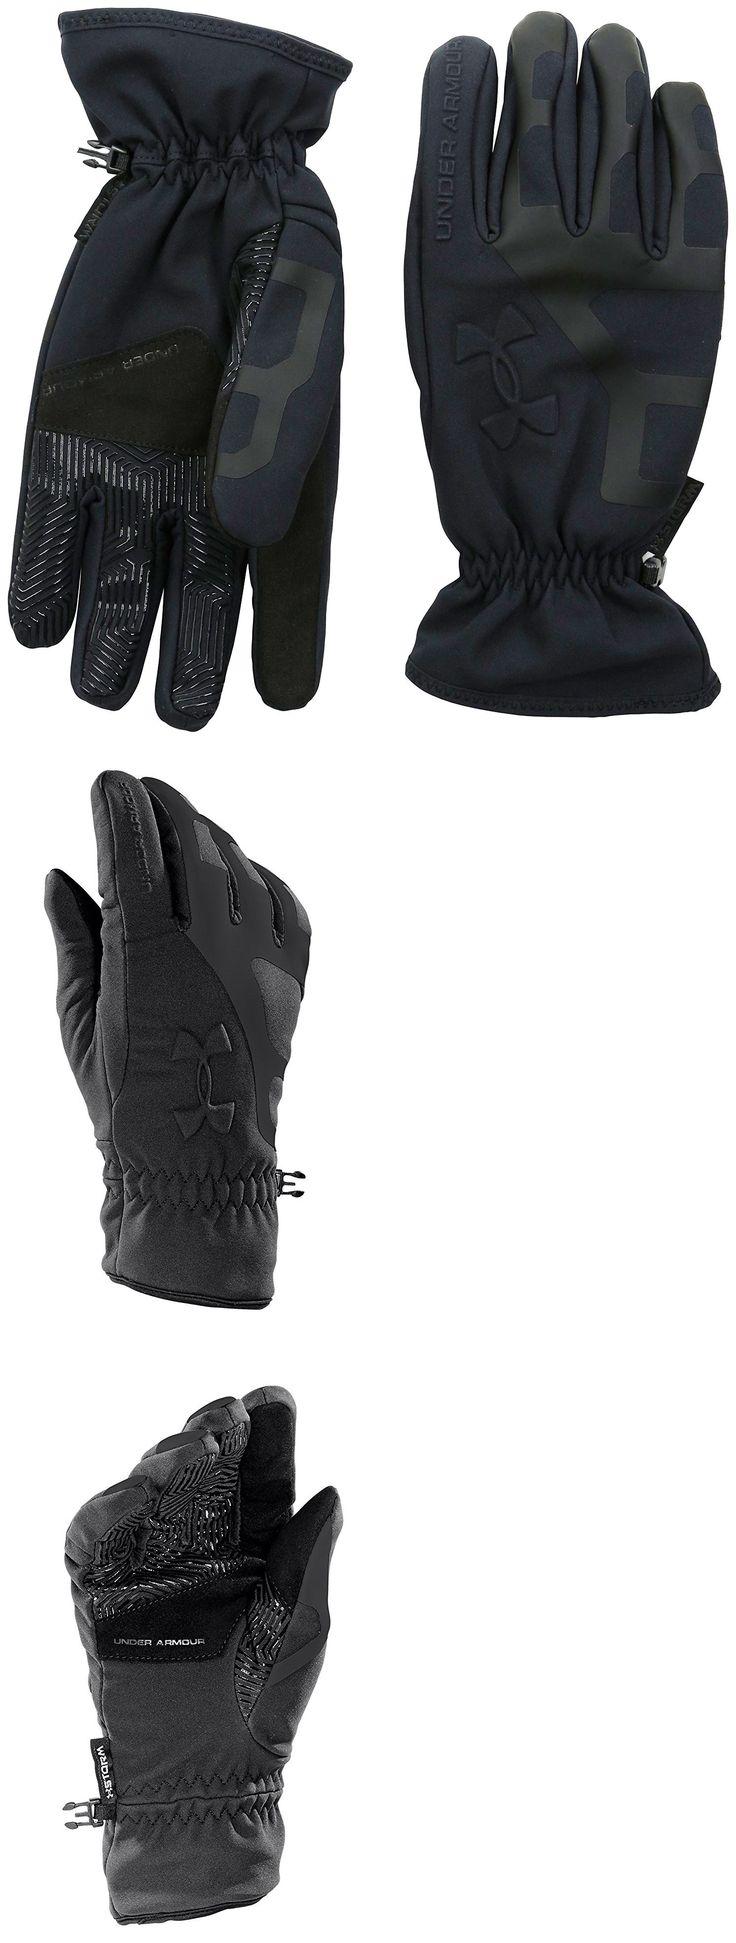 Mens leather gloves rei - Running Gloves 179810 Under Armour Mens Black Black Ua Storm Stealth Cgi Warmest Tech